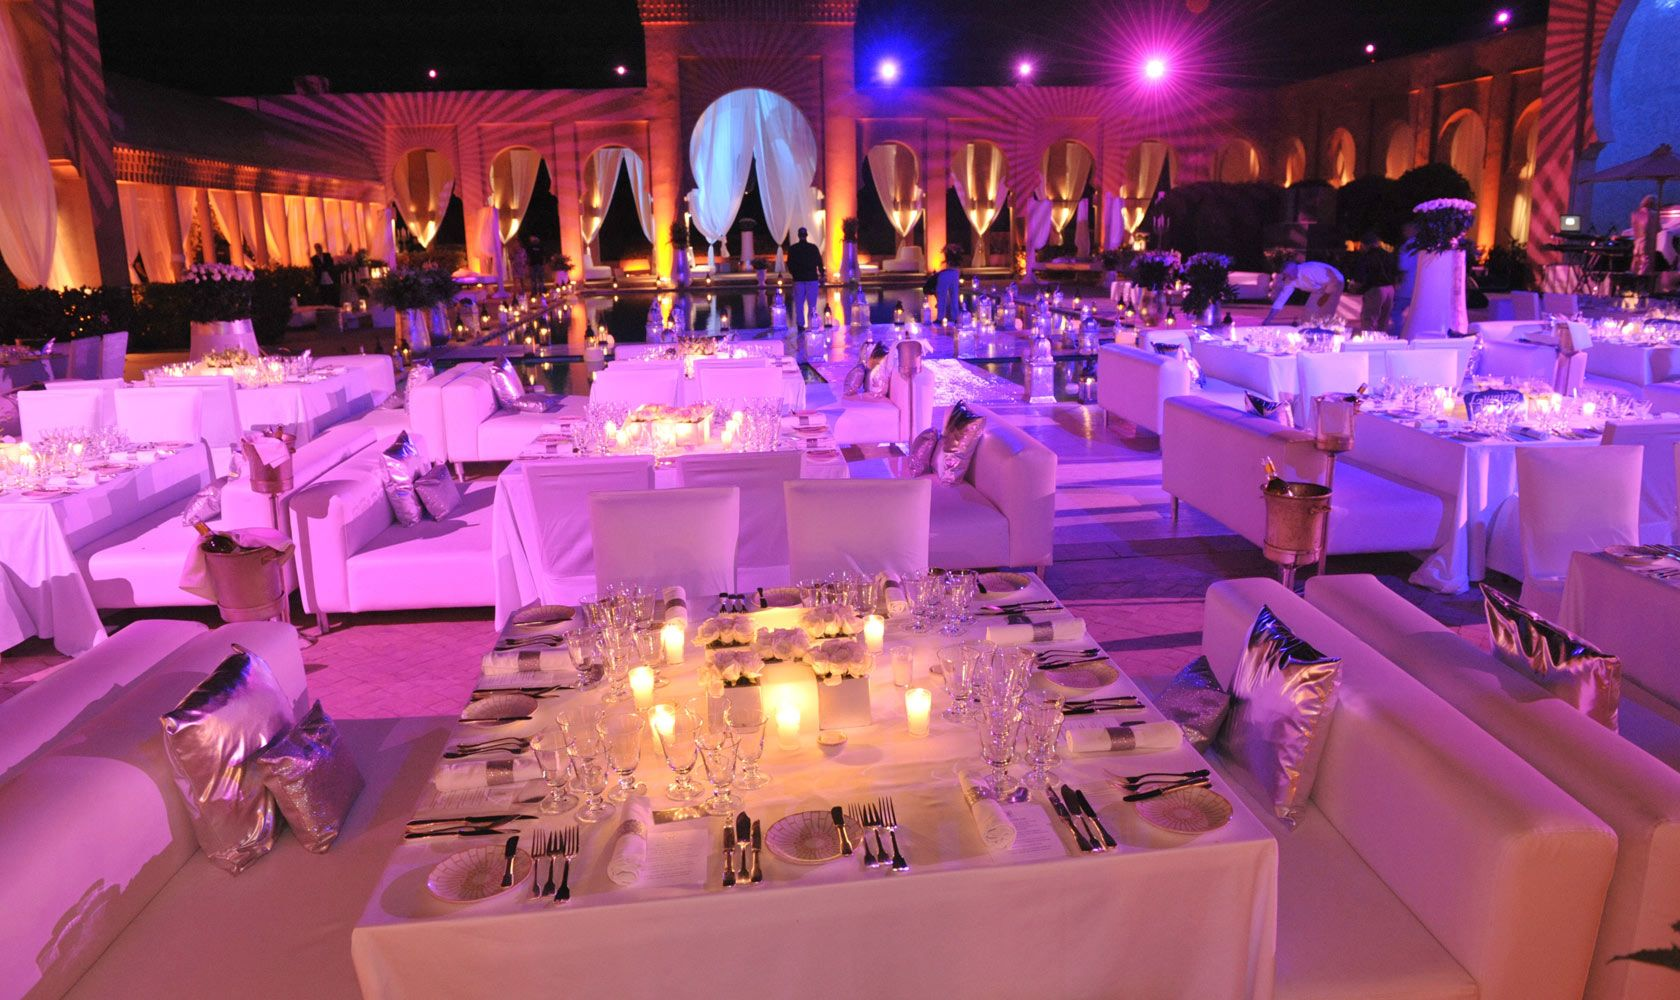 Salle De Mariage Luxe Dedans Wedding Queen Paris Robe De Mariage